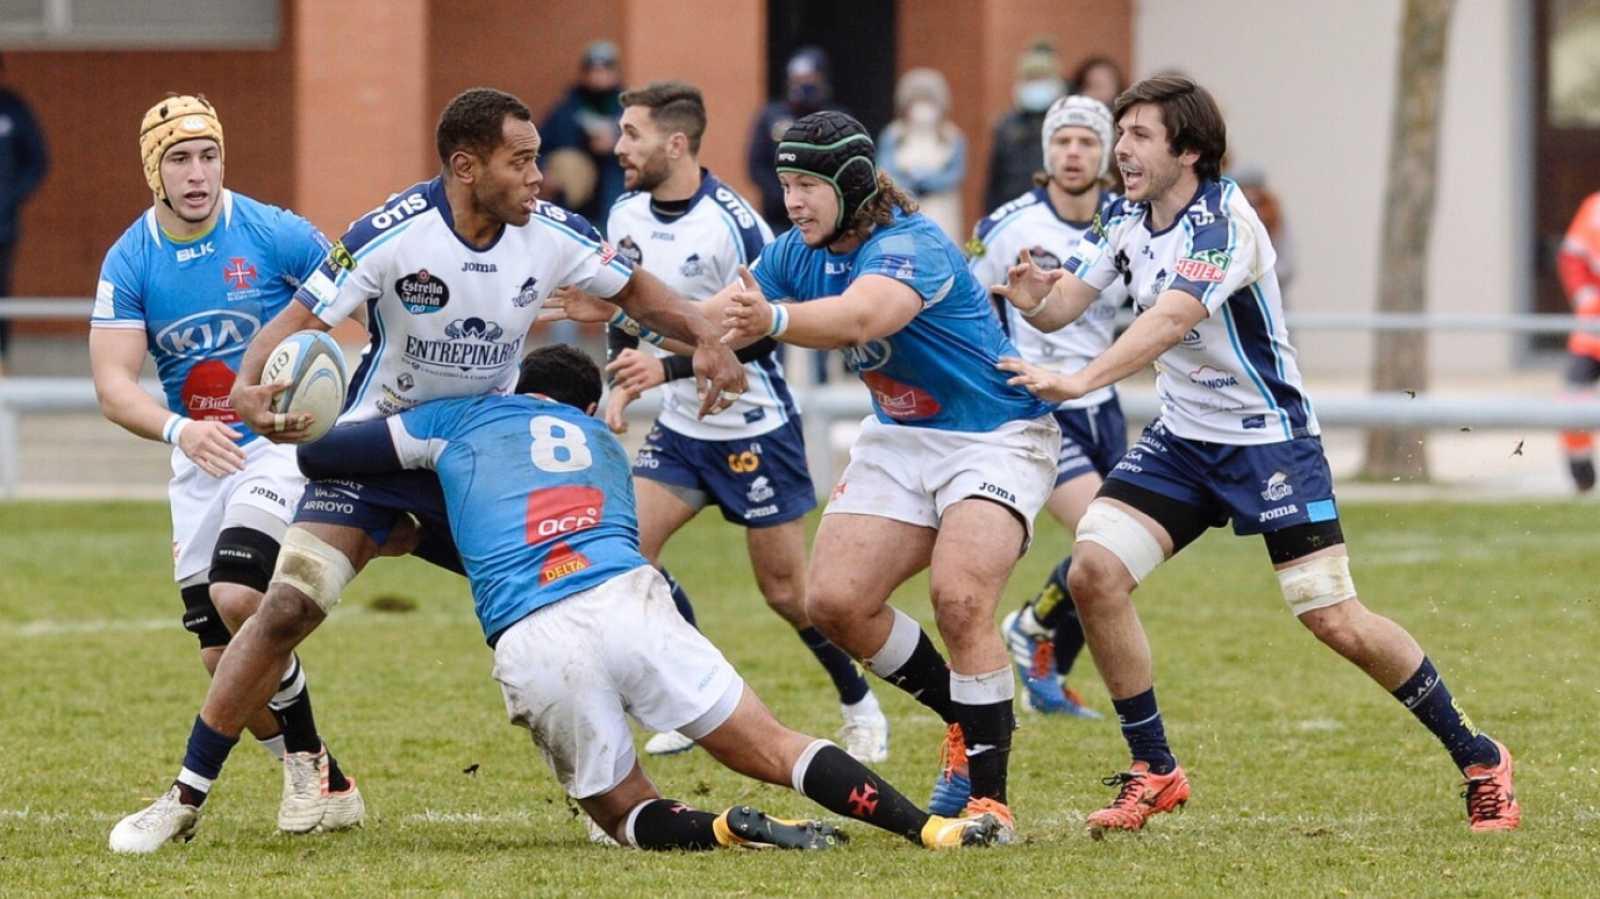 Rugby - Copa Ibérica masculina. Final: Vrac Quesos Entrepinares - Os Belenenses - ver ahora